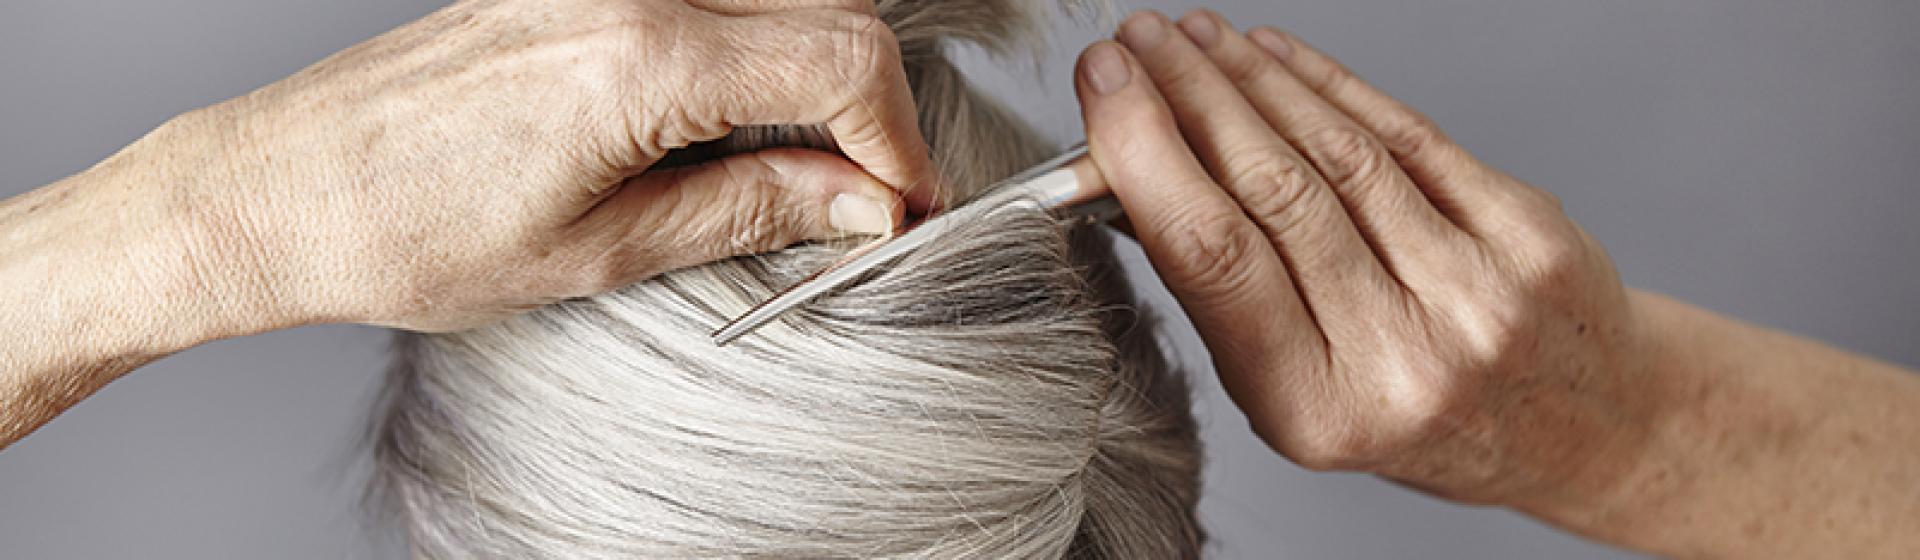 RF_website_expert-dossier-gray-hair_keeping-hair-white_why-yellowed_804x446